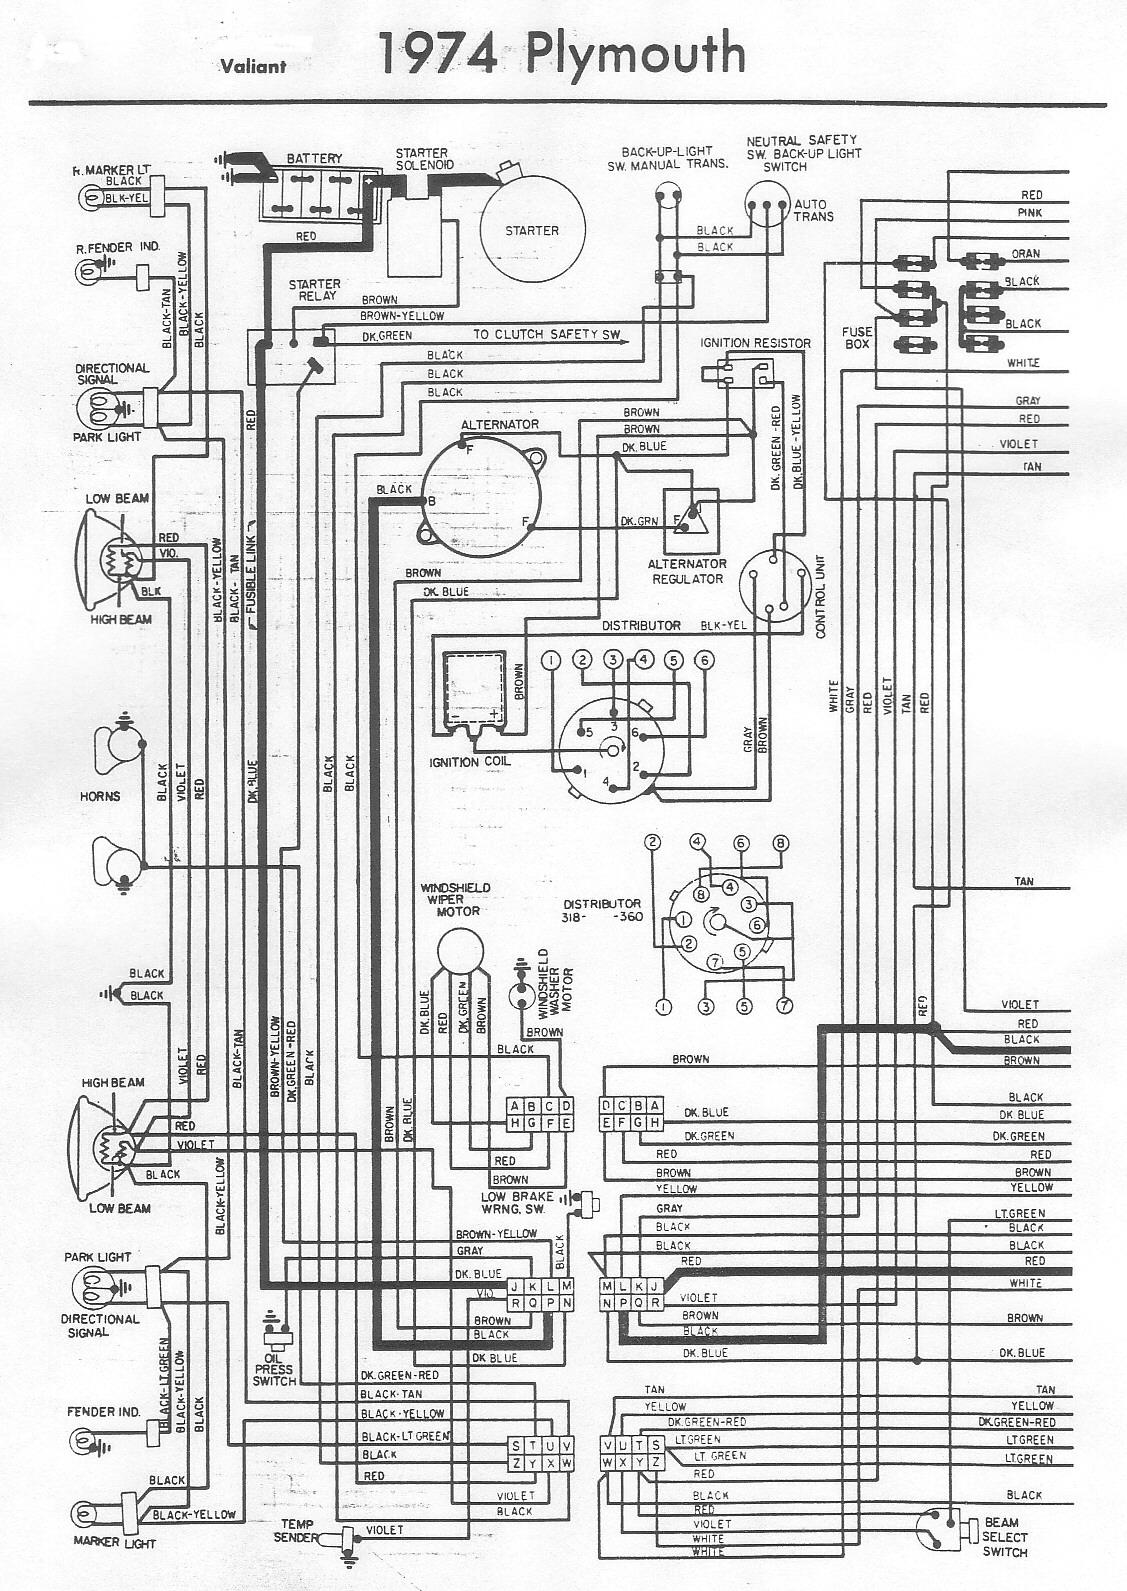 FC_3931] Nova Starter Wiring Diagram 74 Get Free Image About Wiring Diagram  Wiring DiagramAnist Gritea Stic Norab Meric Heeve Mohammedshrine Librar Wiring 101